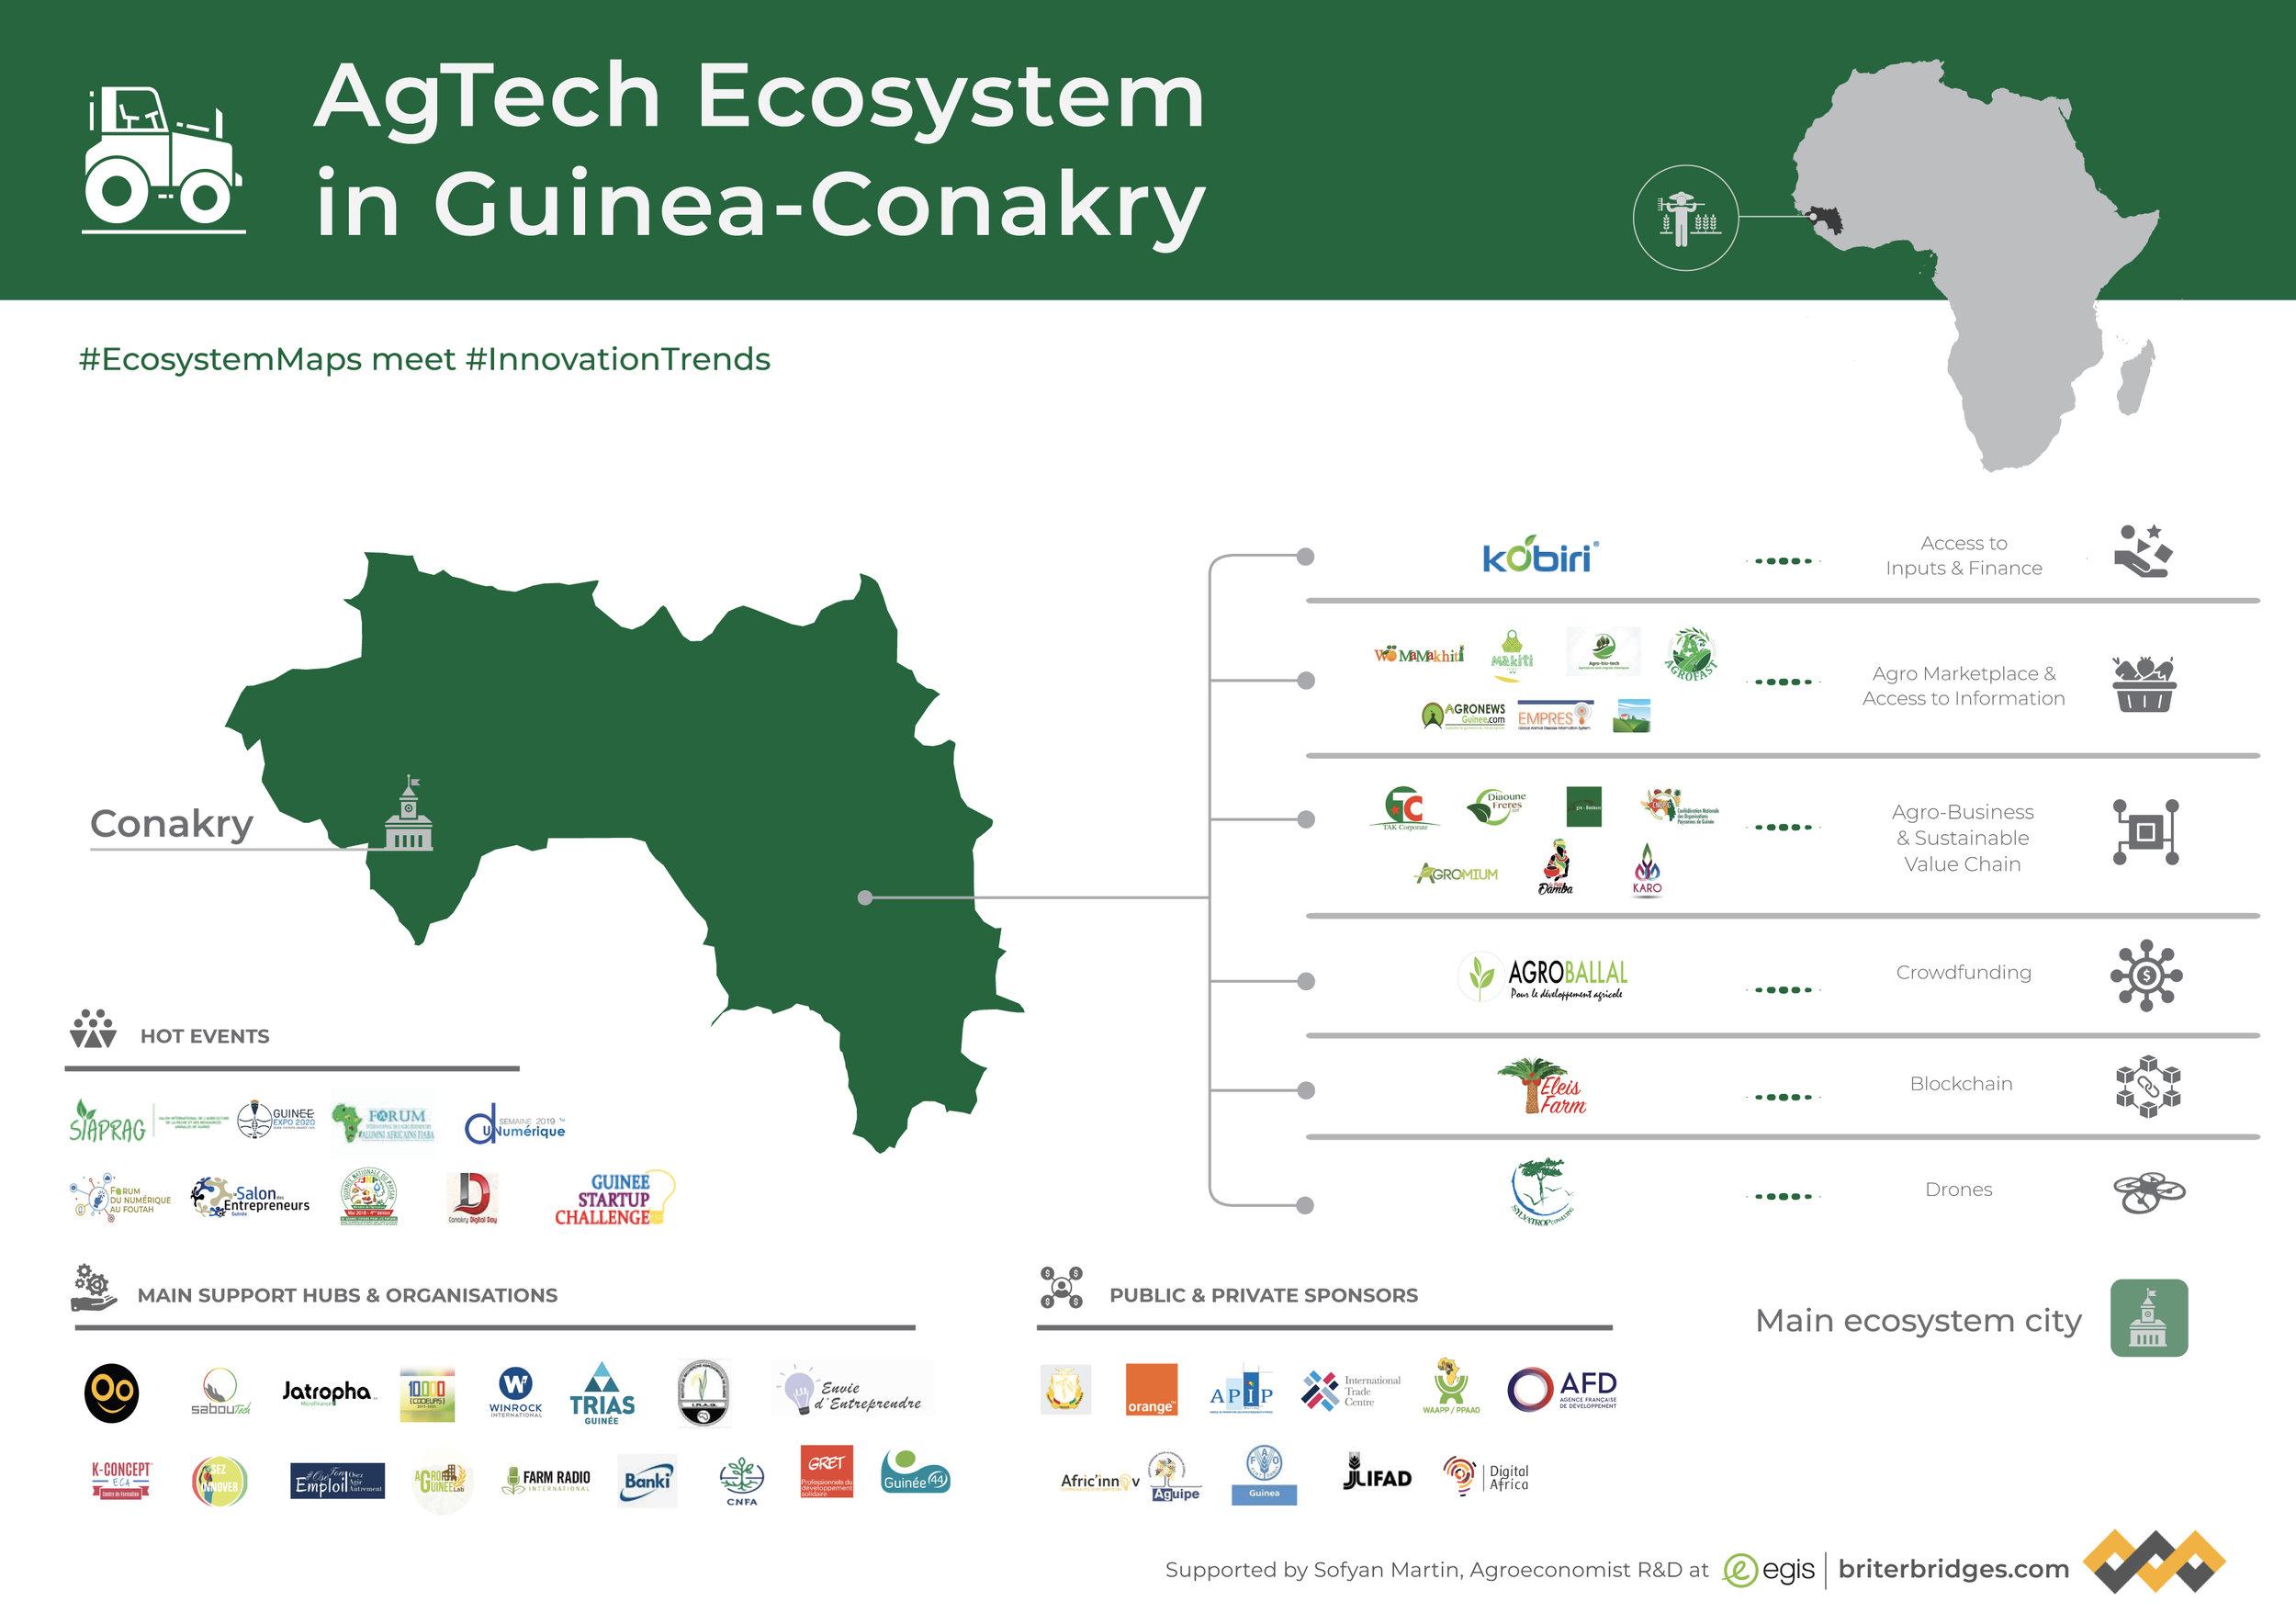 Guinea's AgTech Ecosystem Map